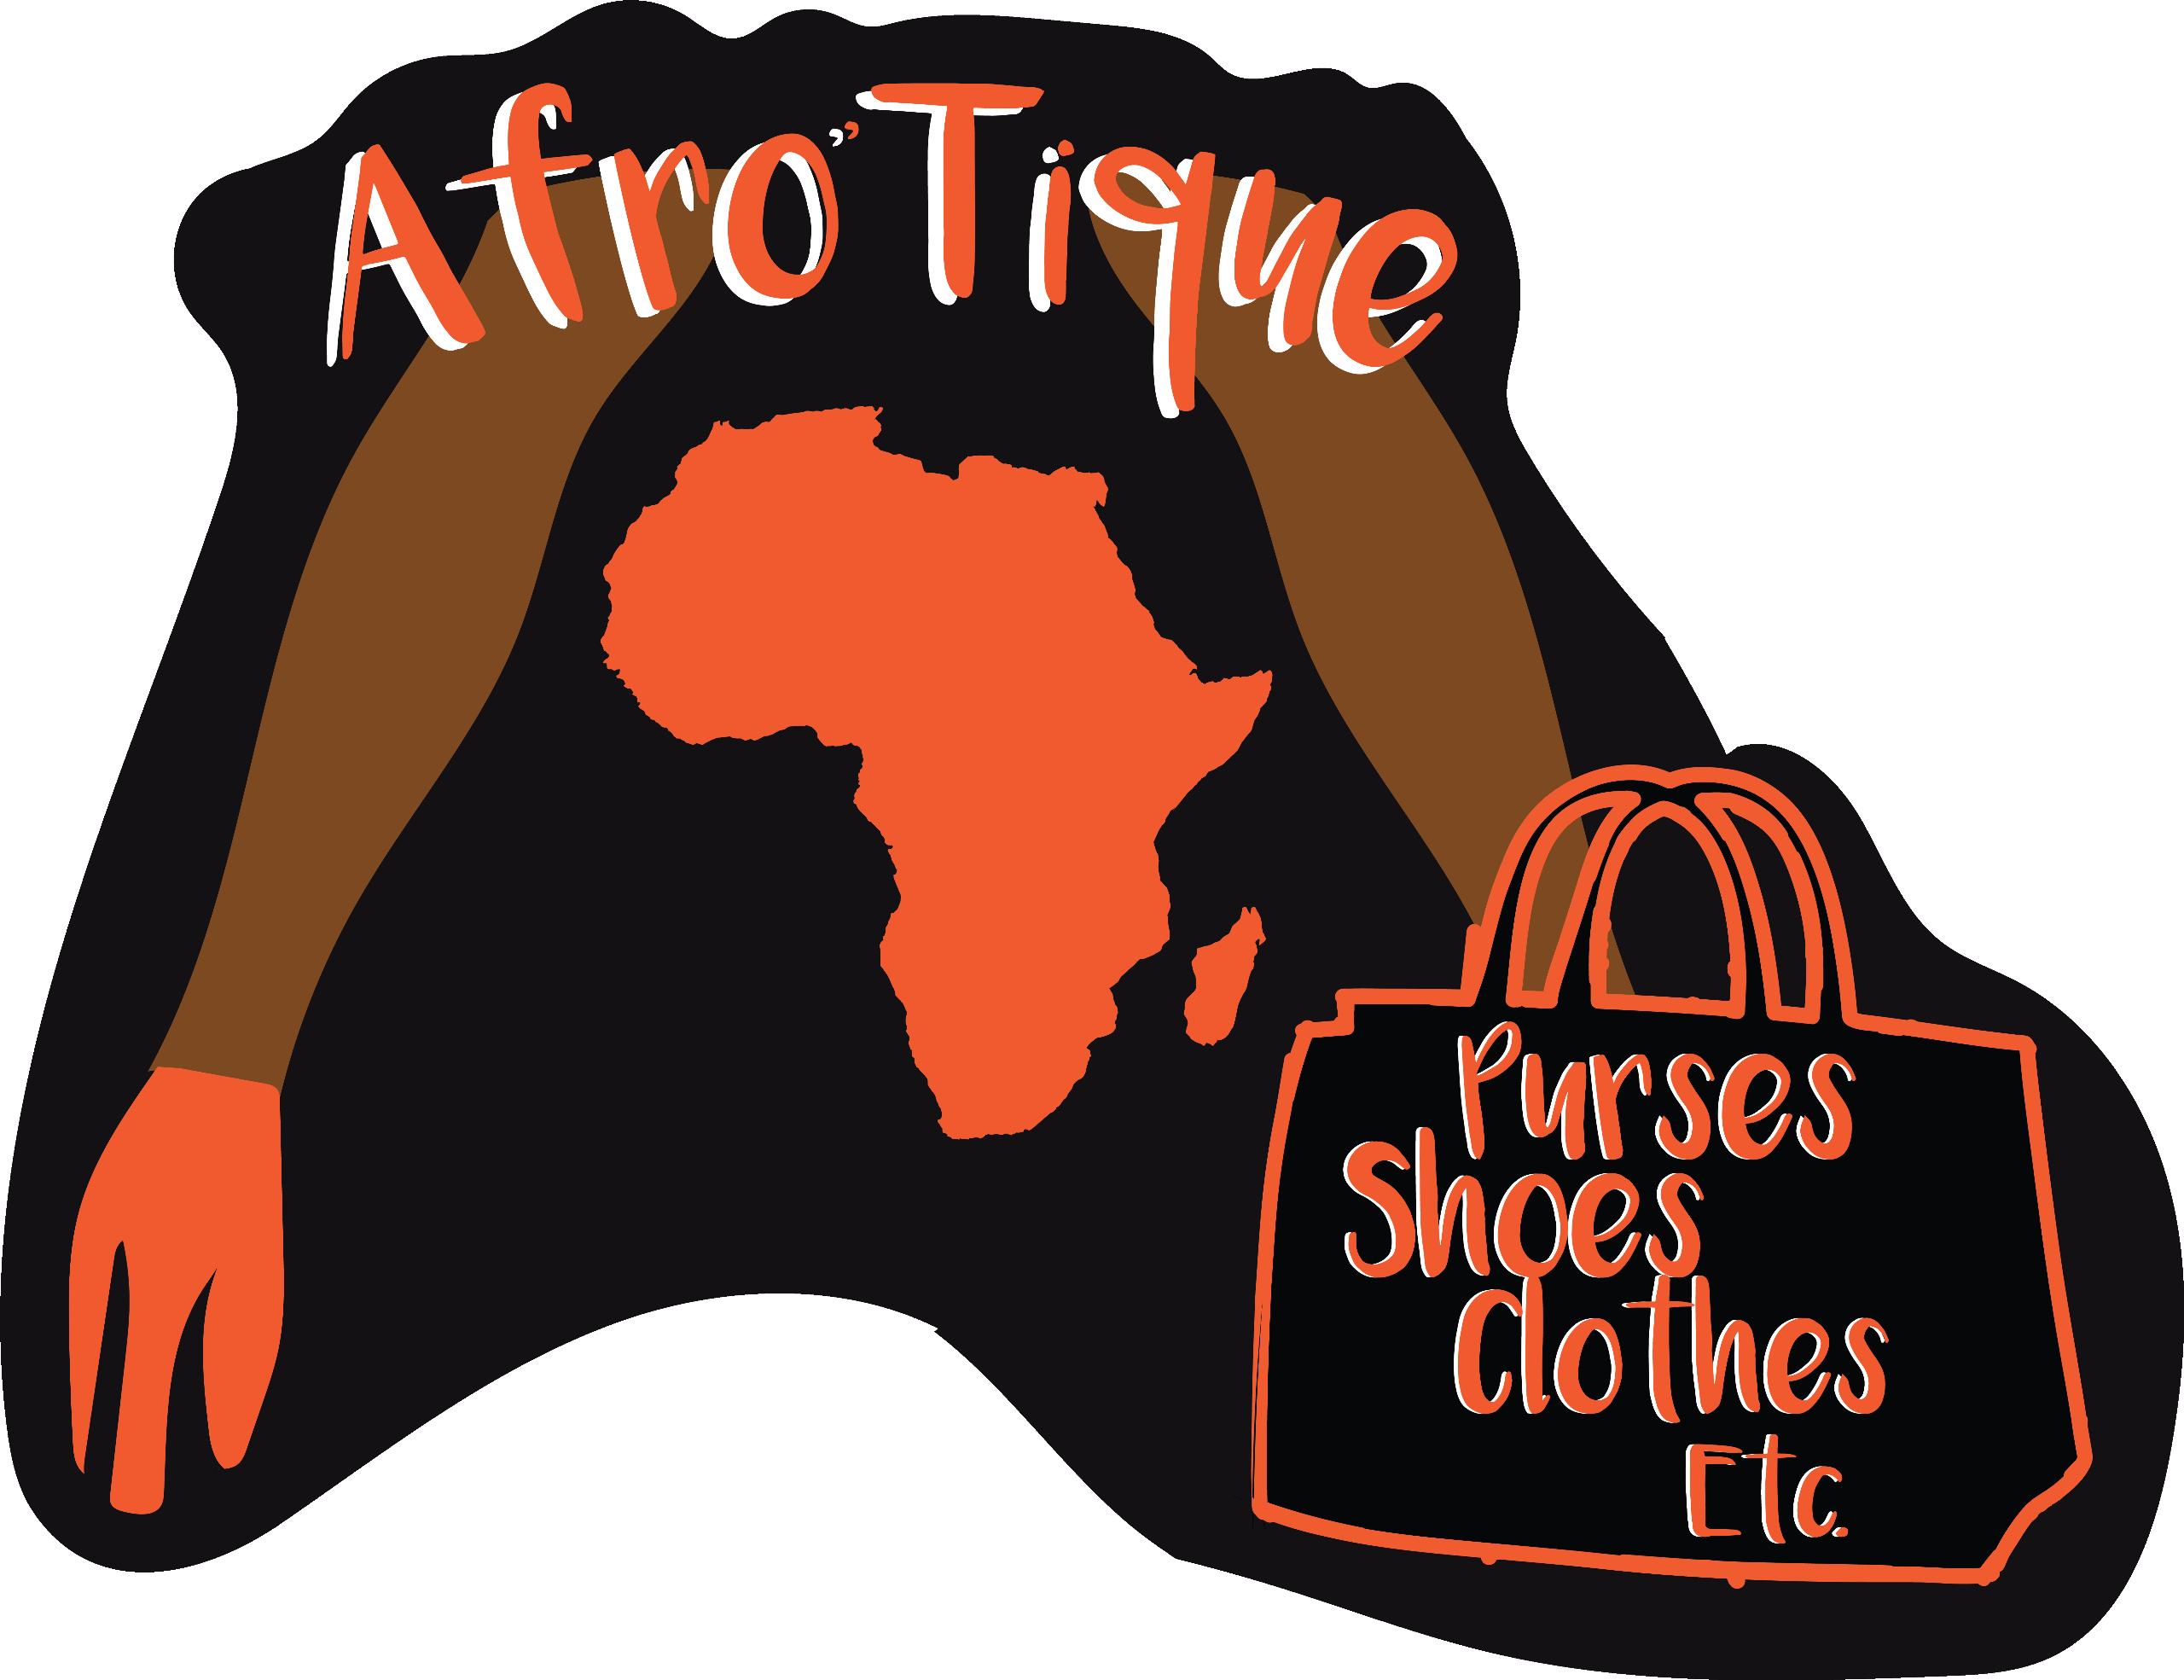 AFRO'TIQUE Logo